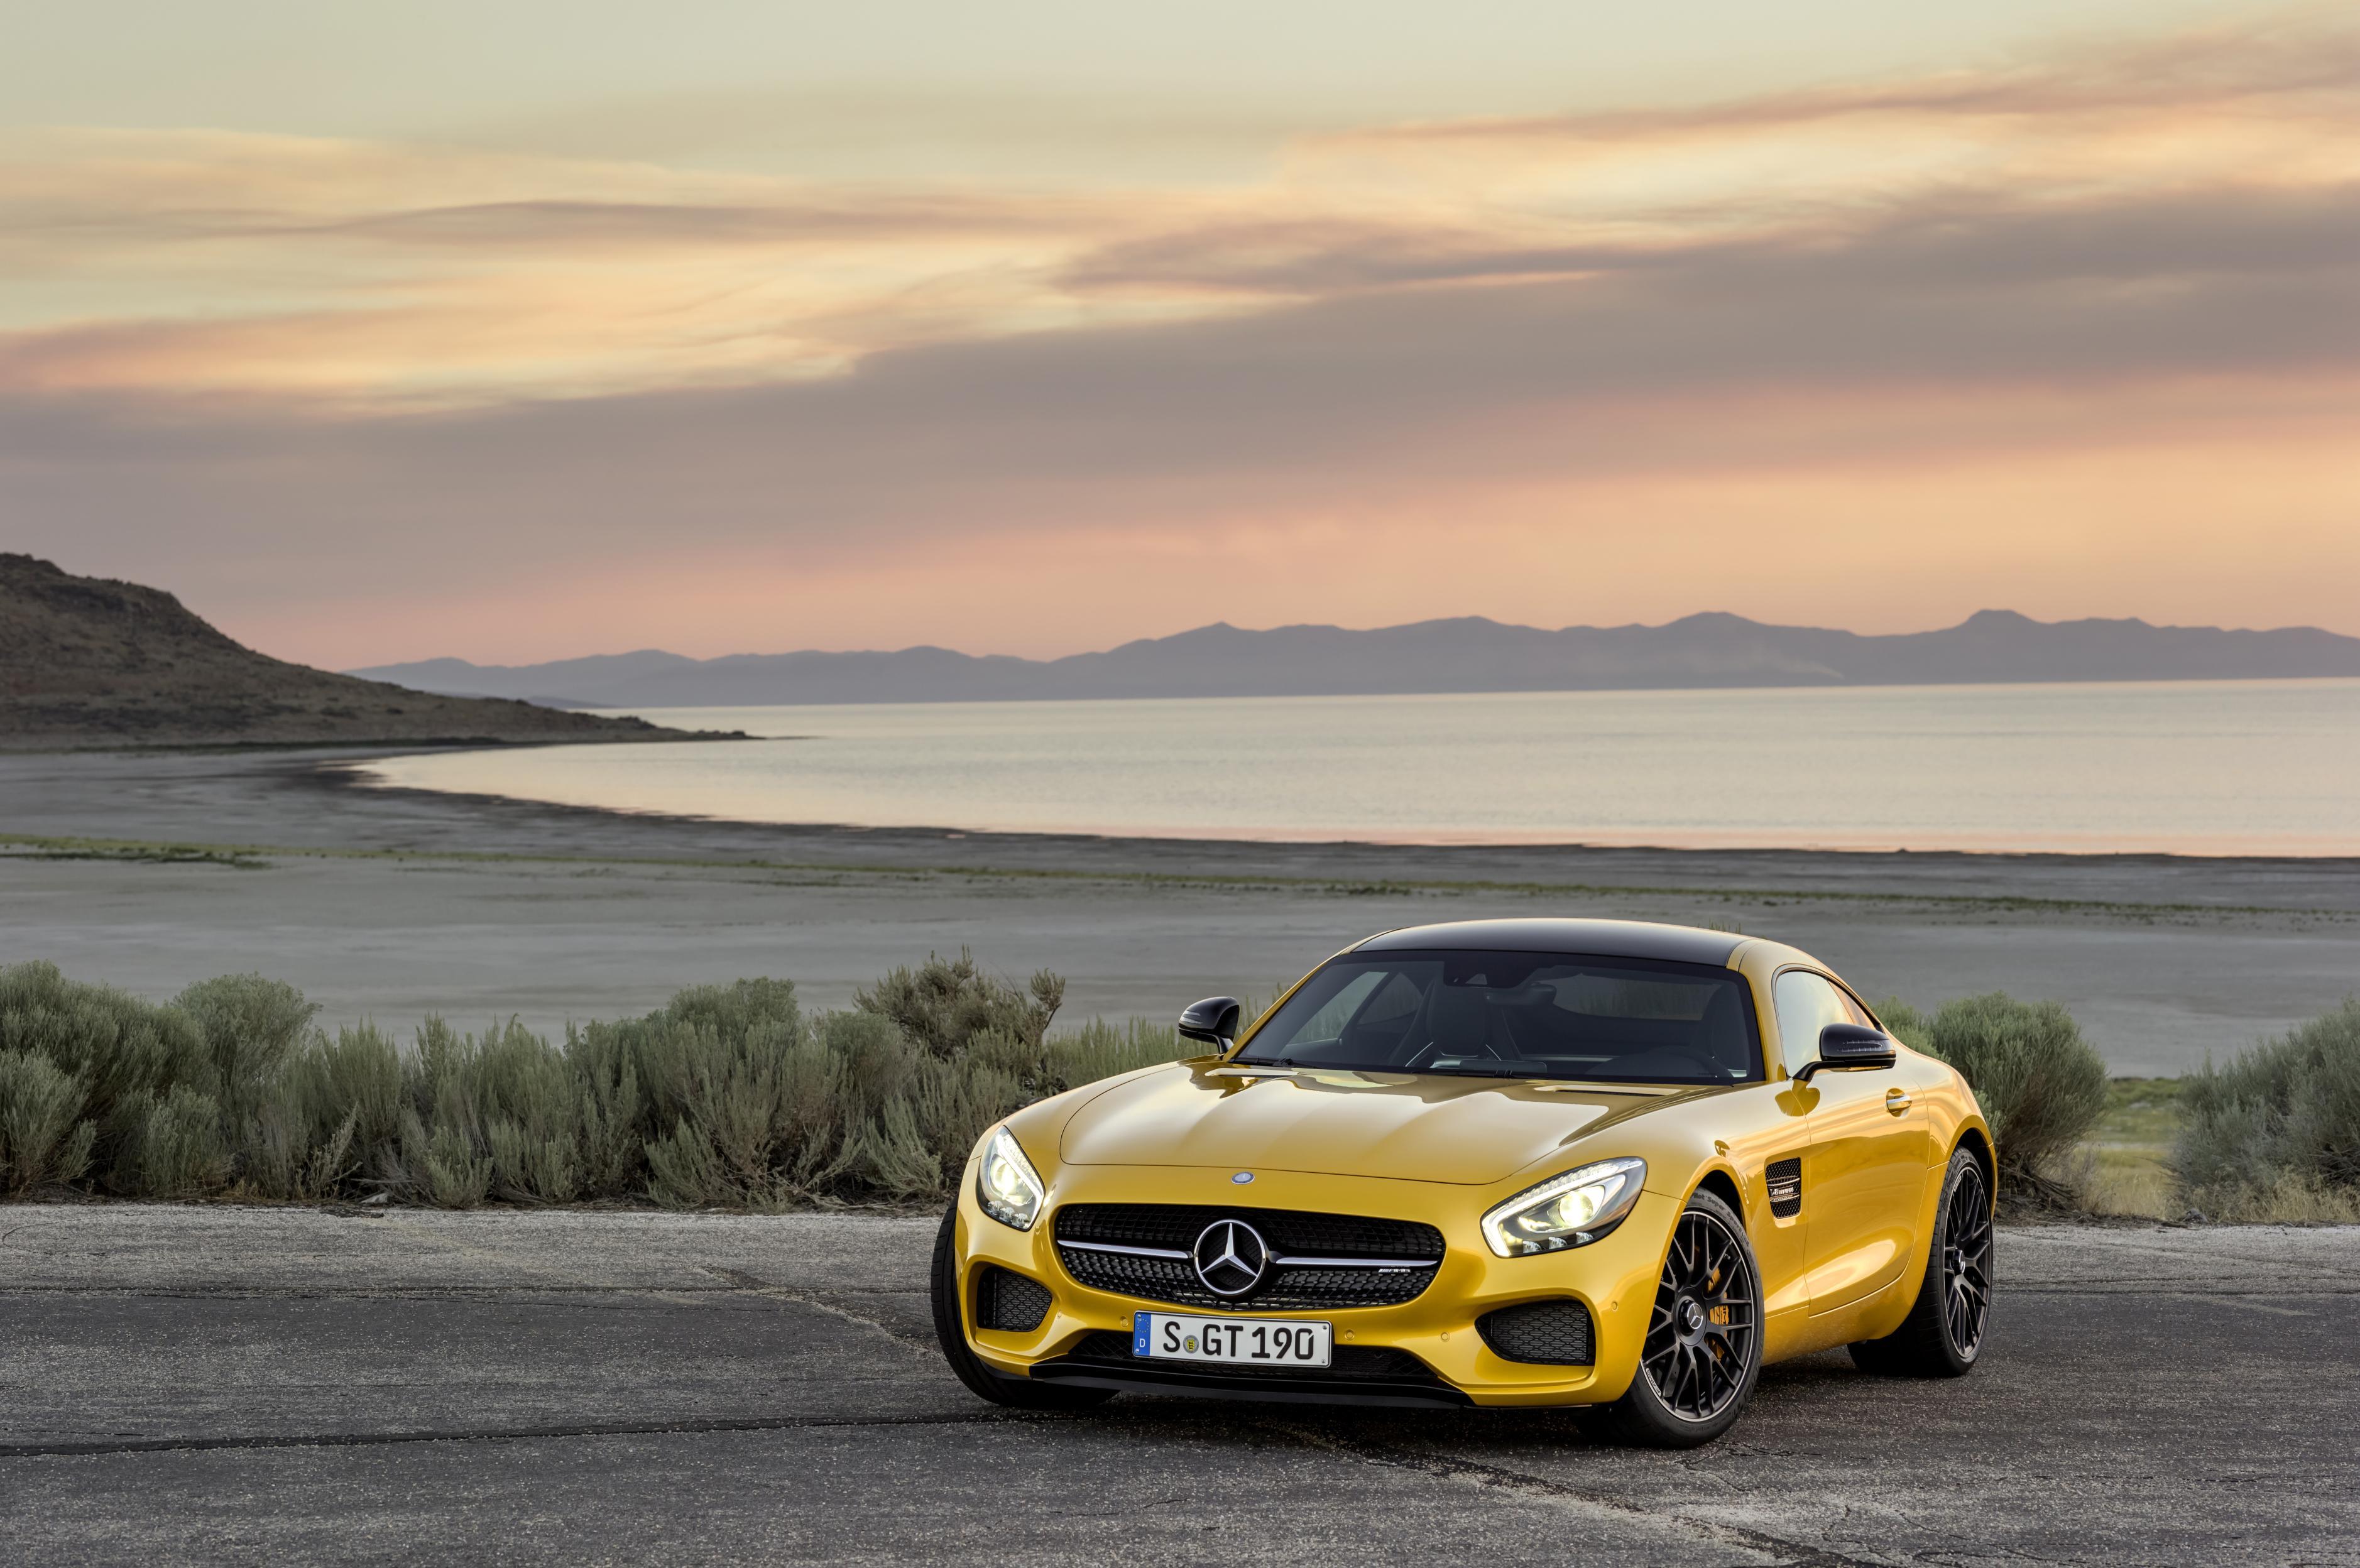 Mercedes-Benz - Home of C, E, S, CLS, CL, SLK, SL, R, GLK, M, GL ...